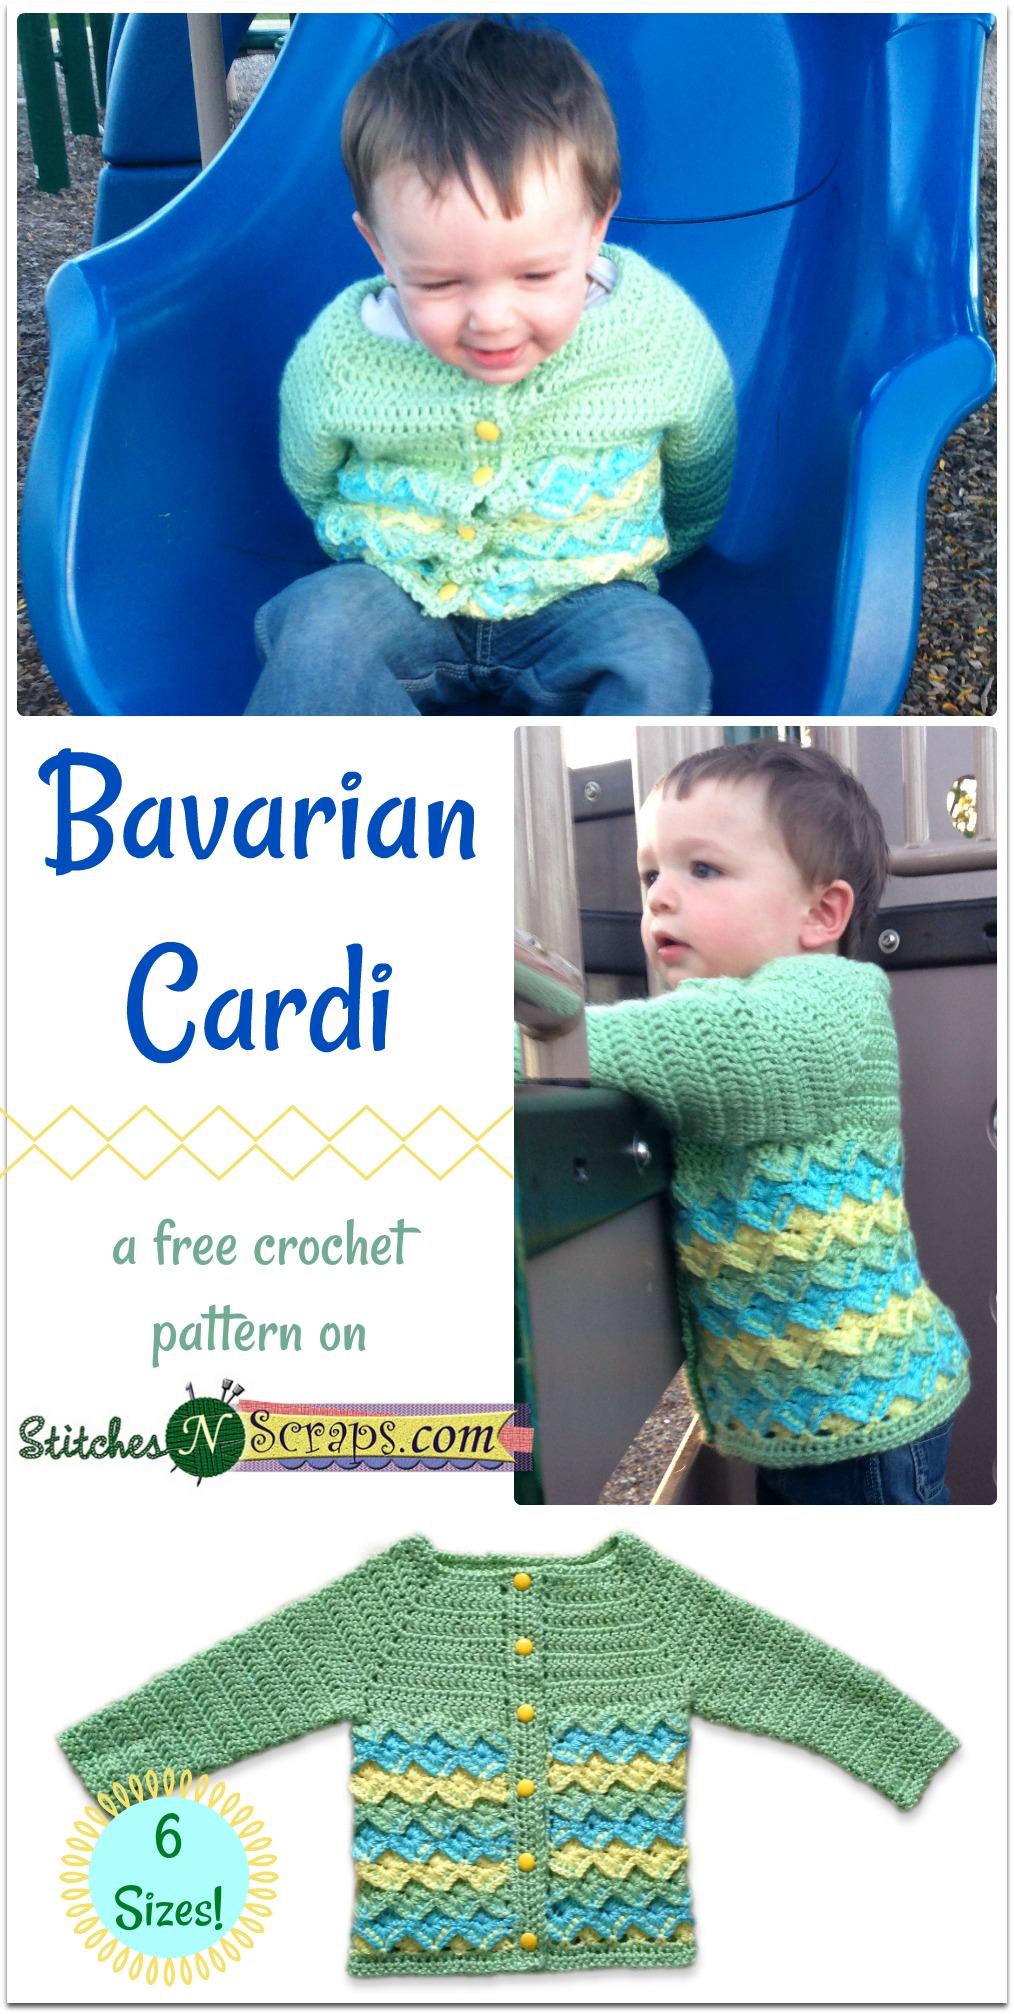 d5a18135e Free Pattern - Bavarian Cardi - Stitches n Scraps